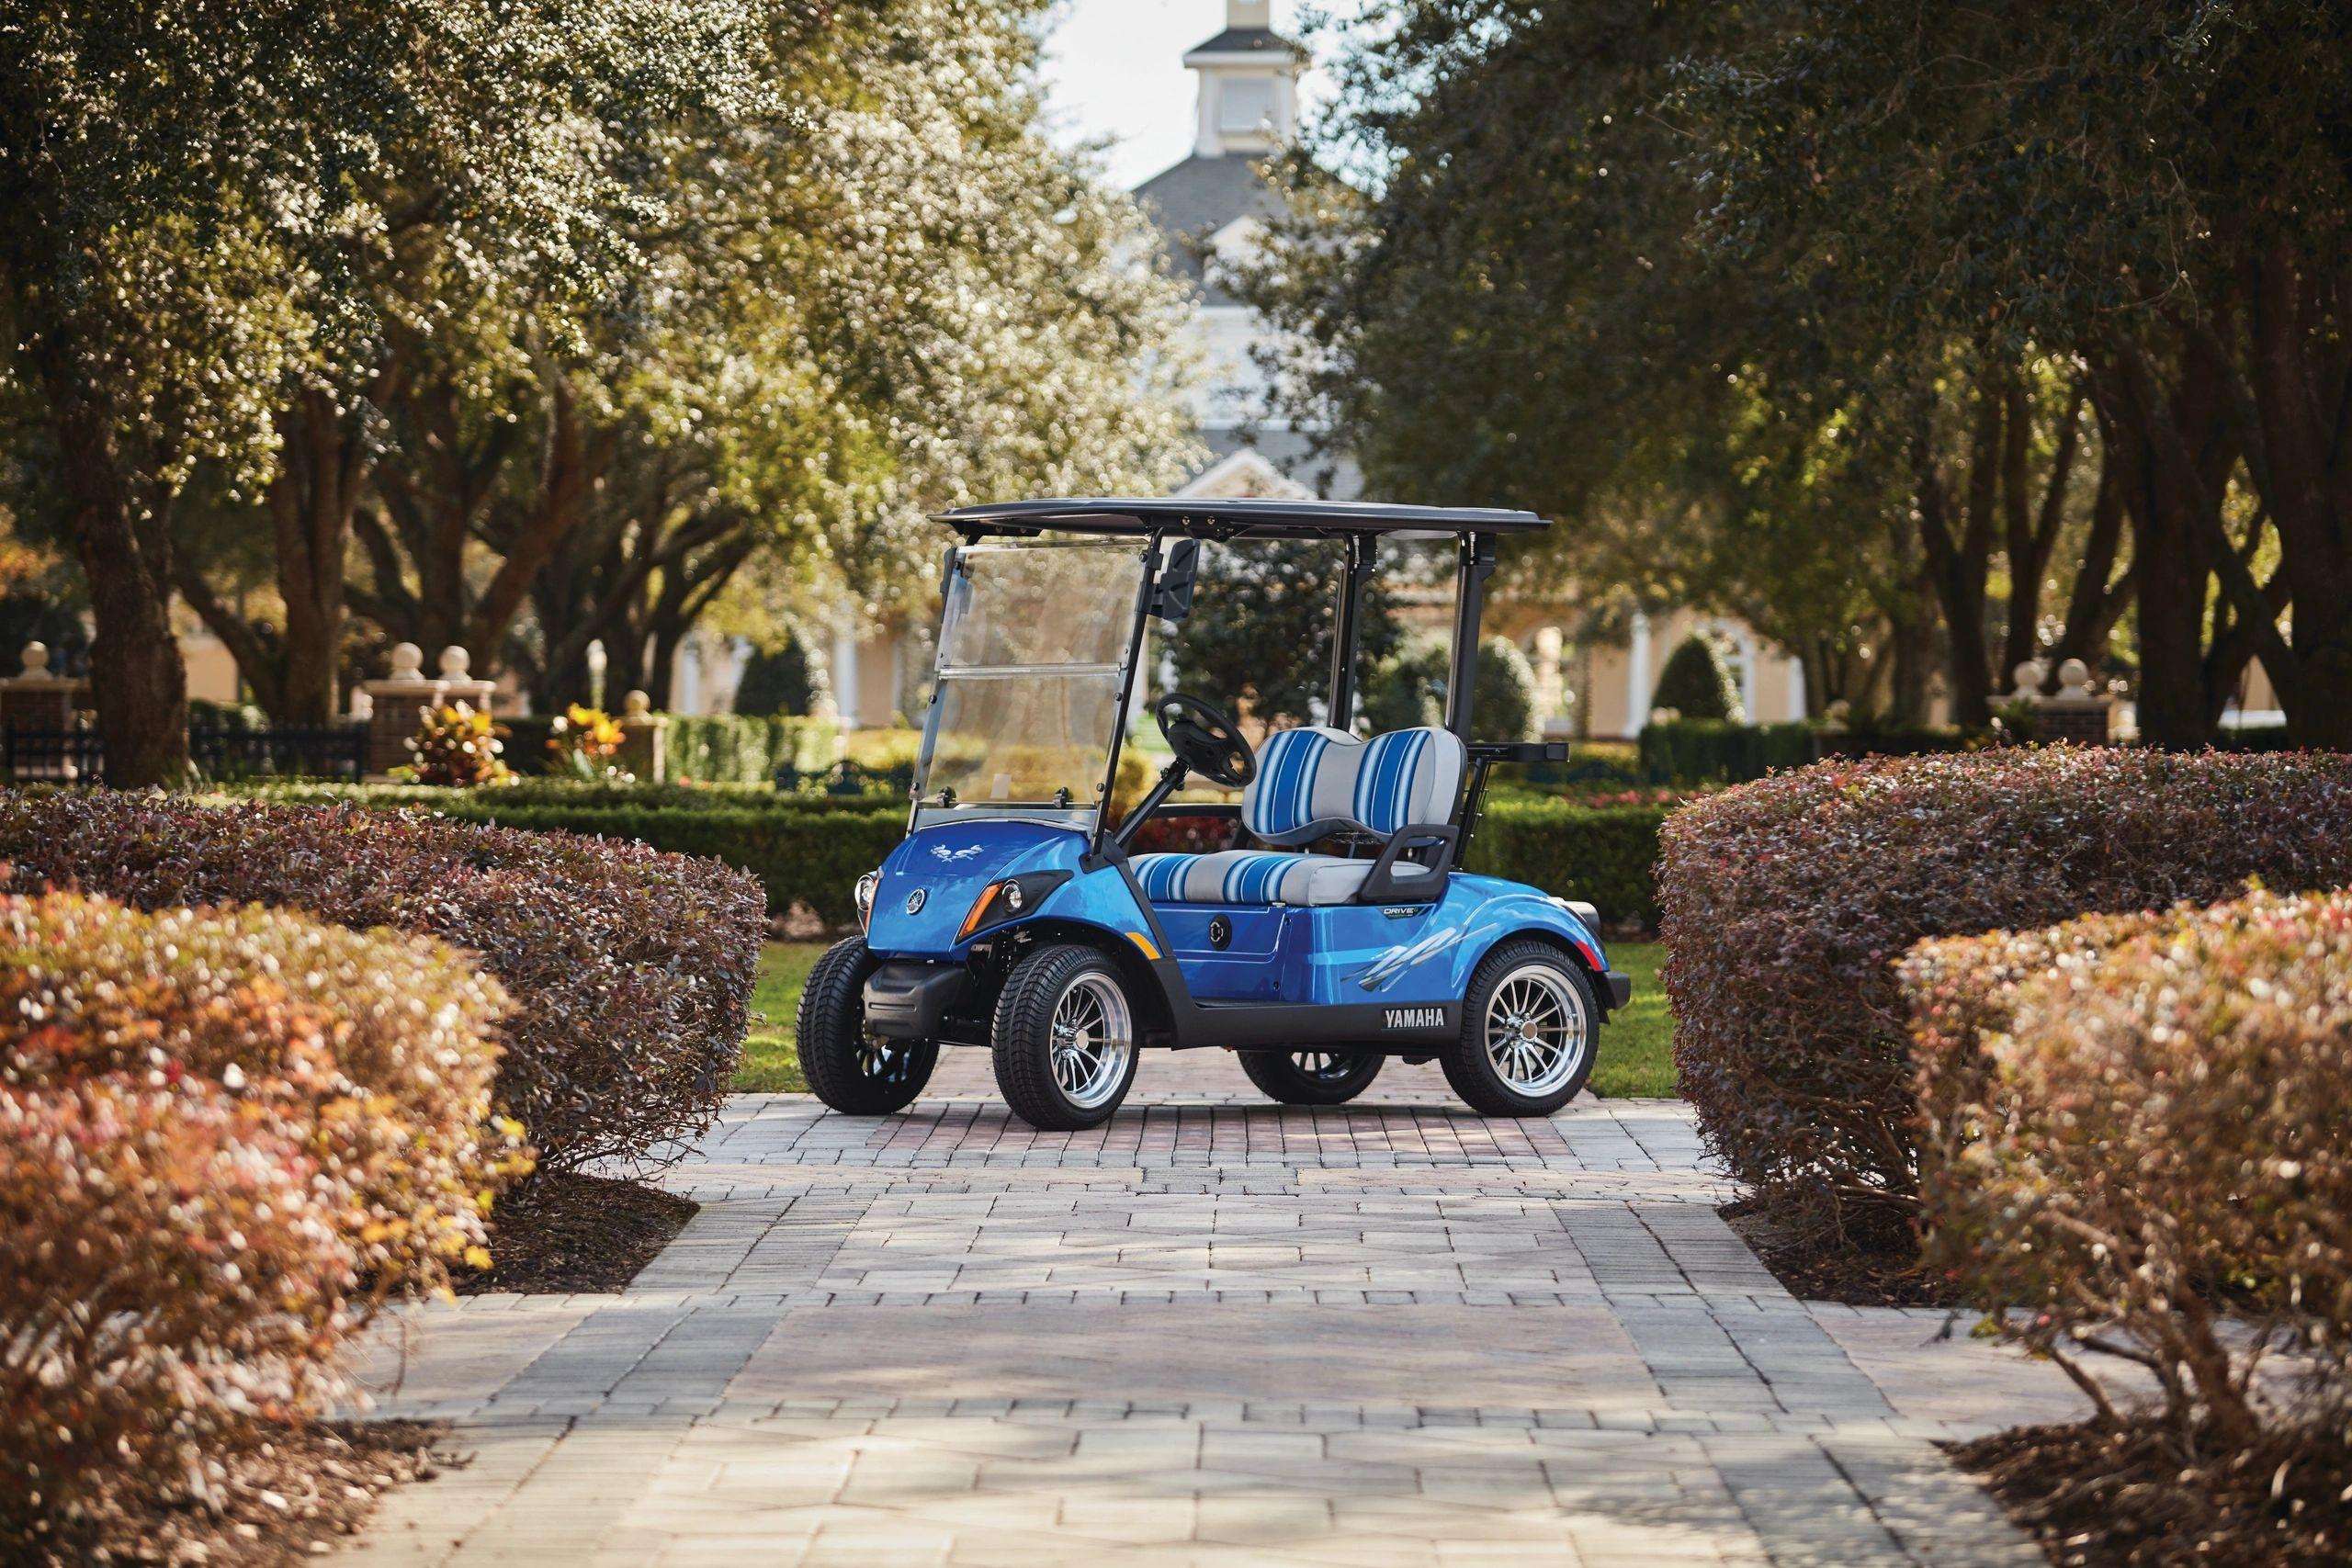 EASY RIDE GOLF CARS - Golf Cart Sales, Yamaha Golf Cars ... Golf Cart Rental Road Atlanta on beach cart rentals, fork lift rentals, golf carts for rent,